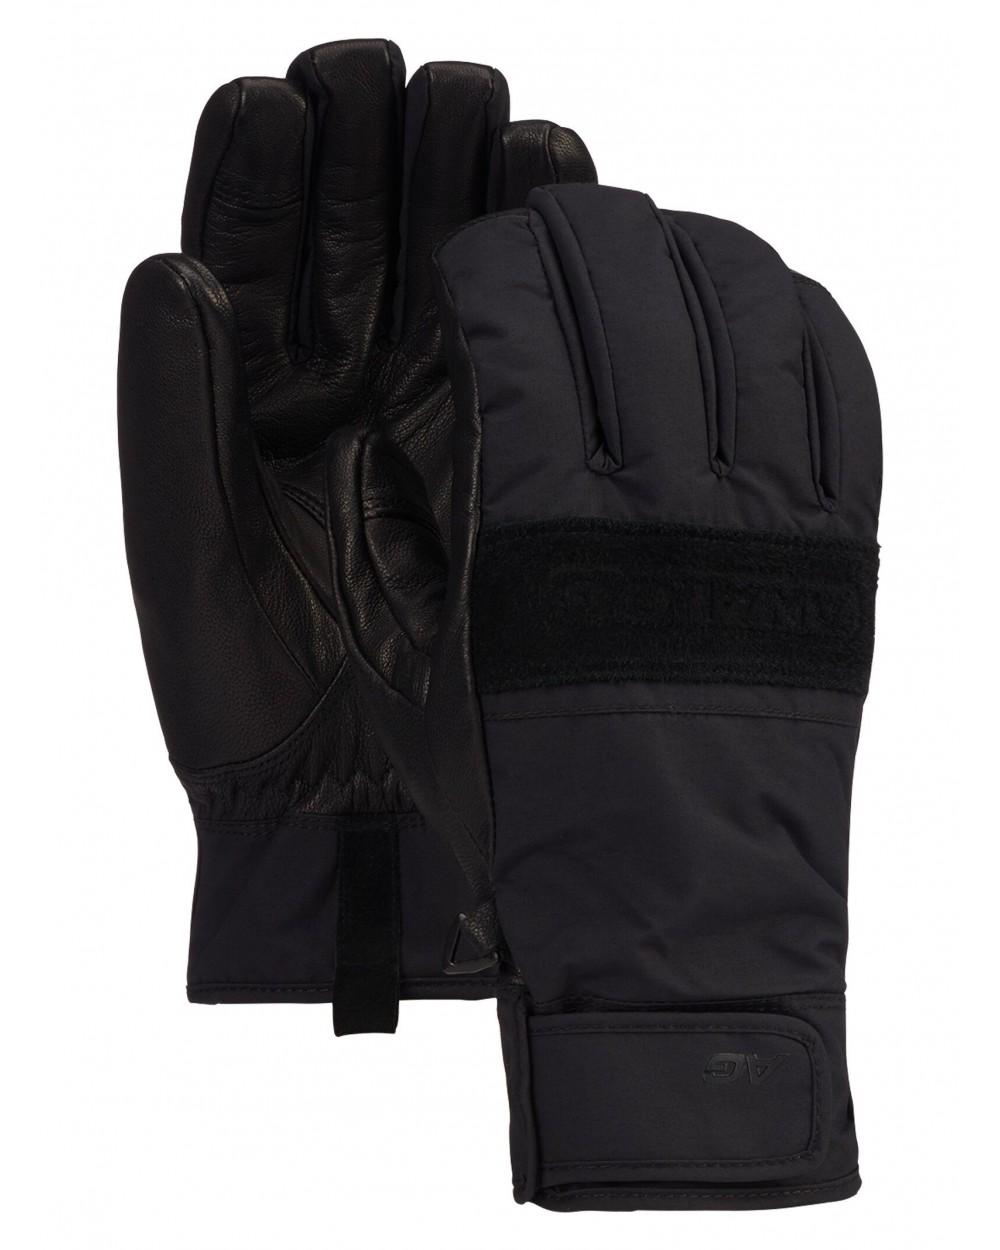 Analog Diligent Glove - True Black